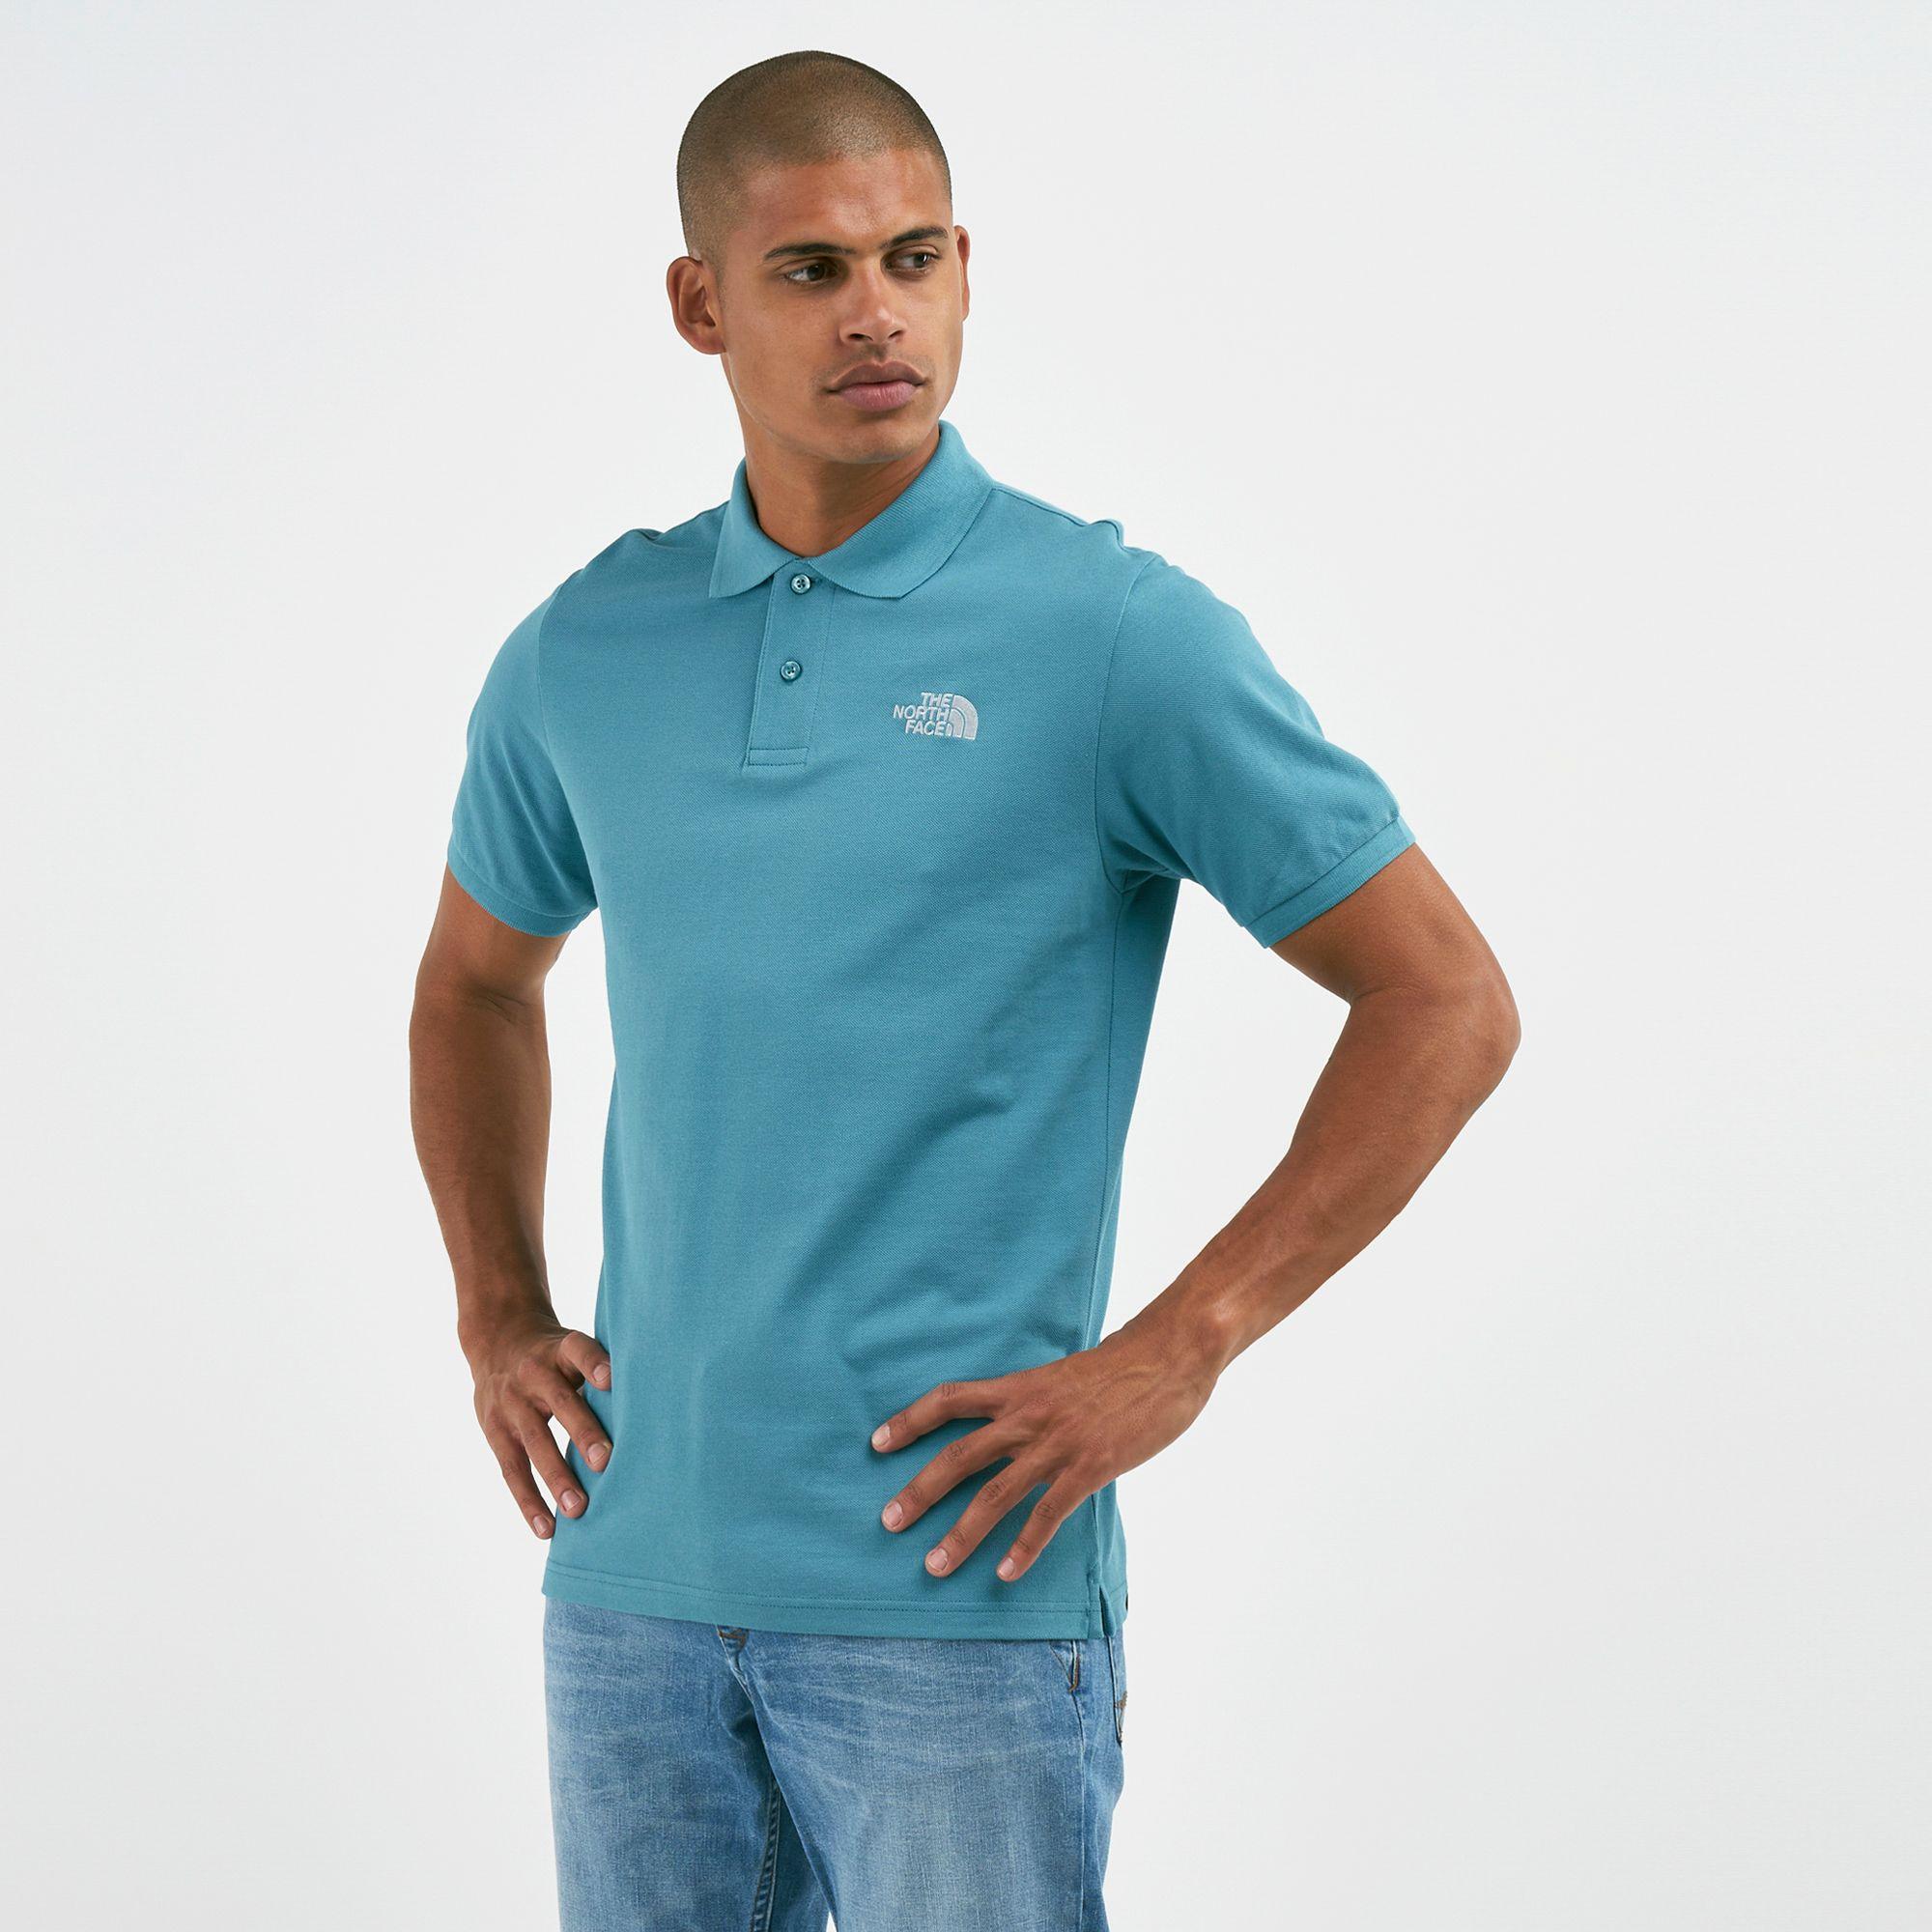 0bb986b50 The North Face Men's Piquet Polo T-Shirt